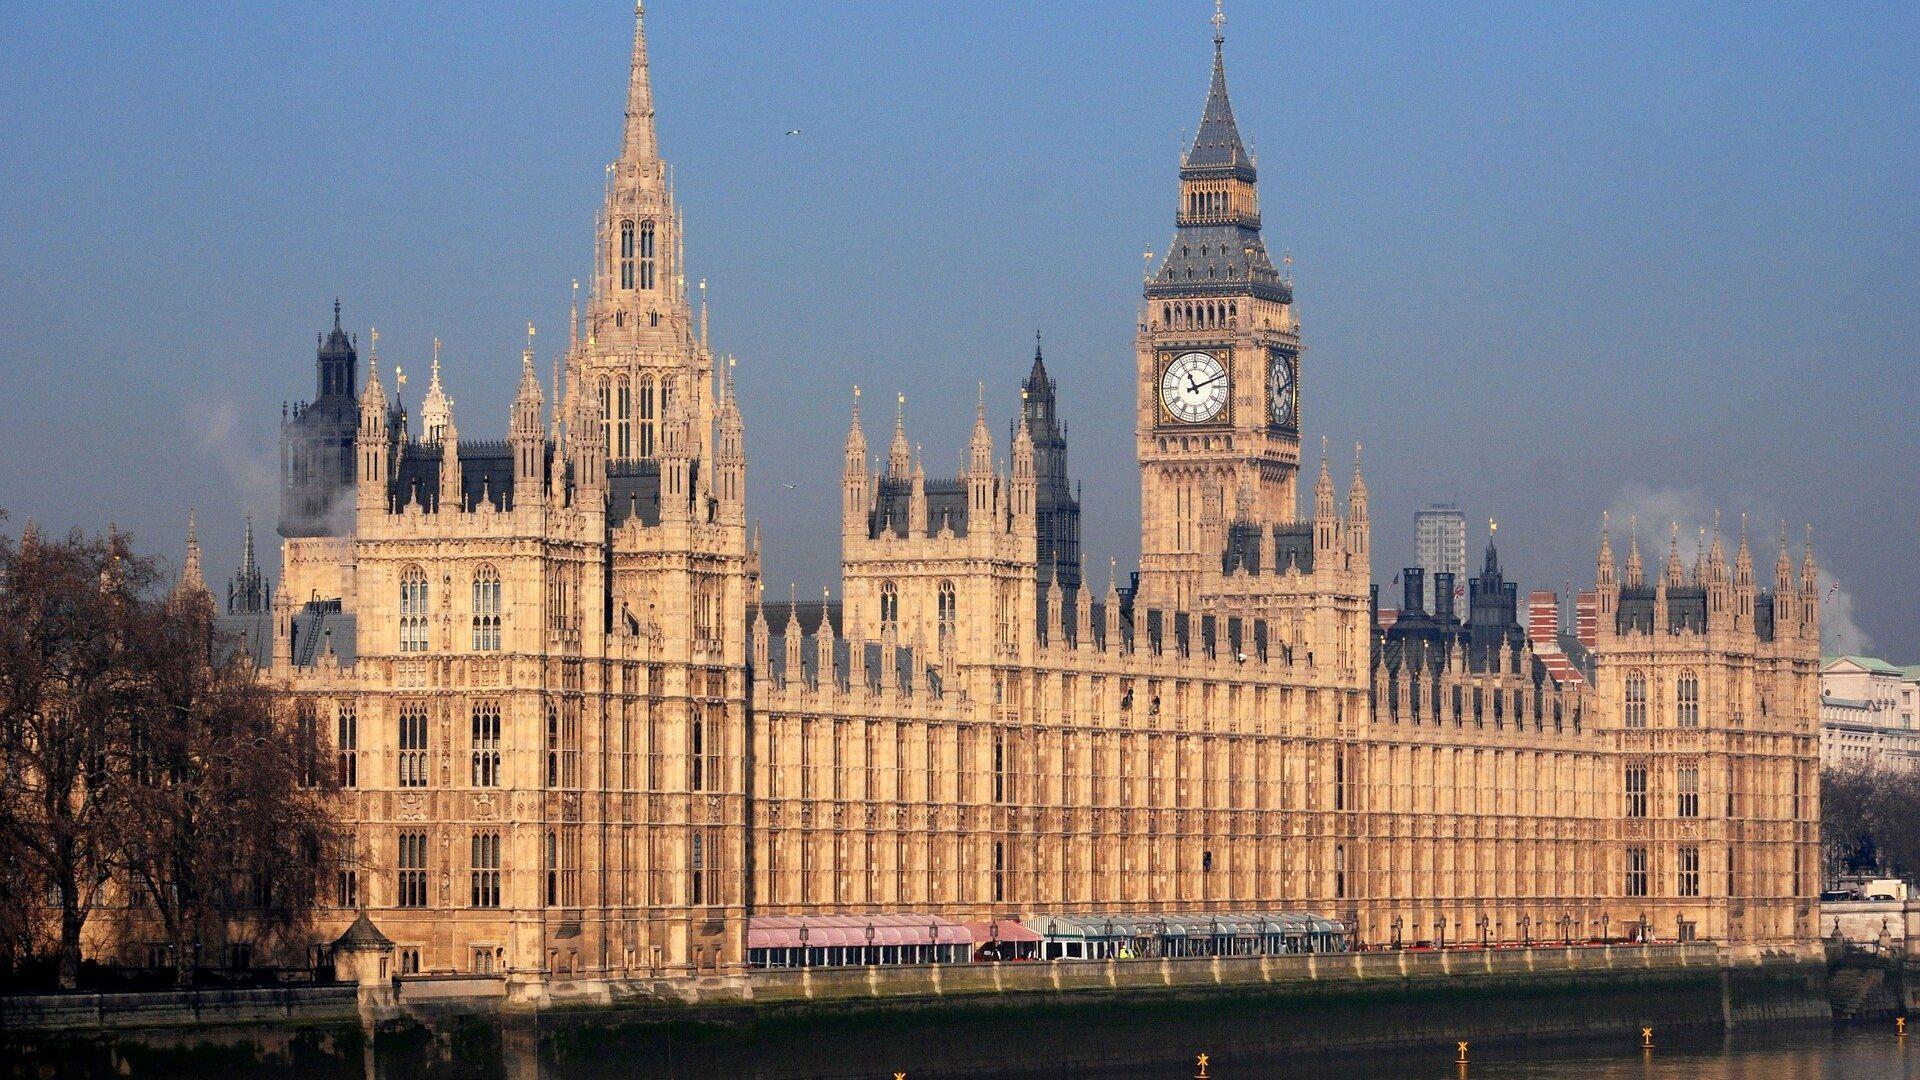 Palacio de Westminster, sede del Parlamento británico - Sputnik Mundo, 1920, 26.06.2021